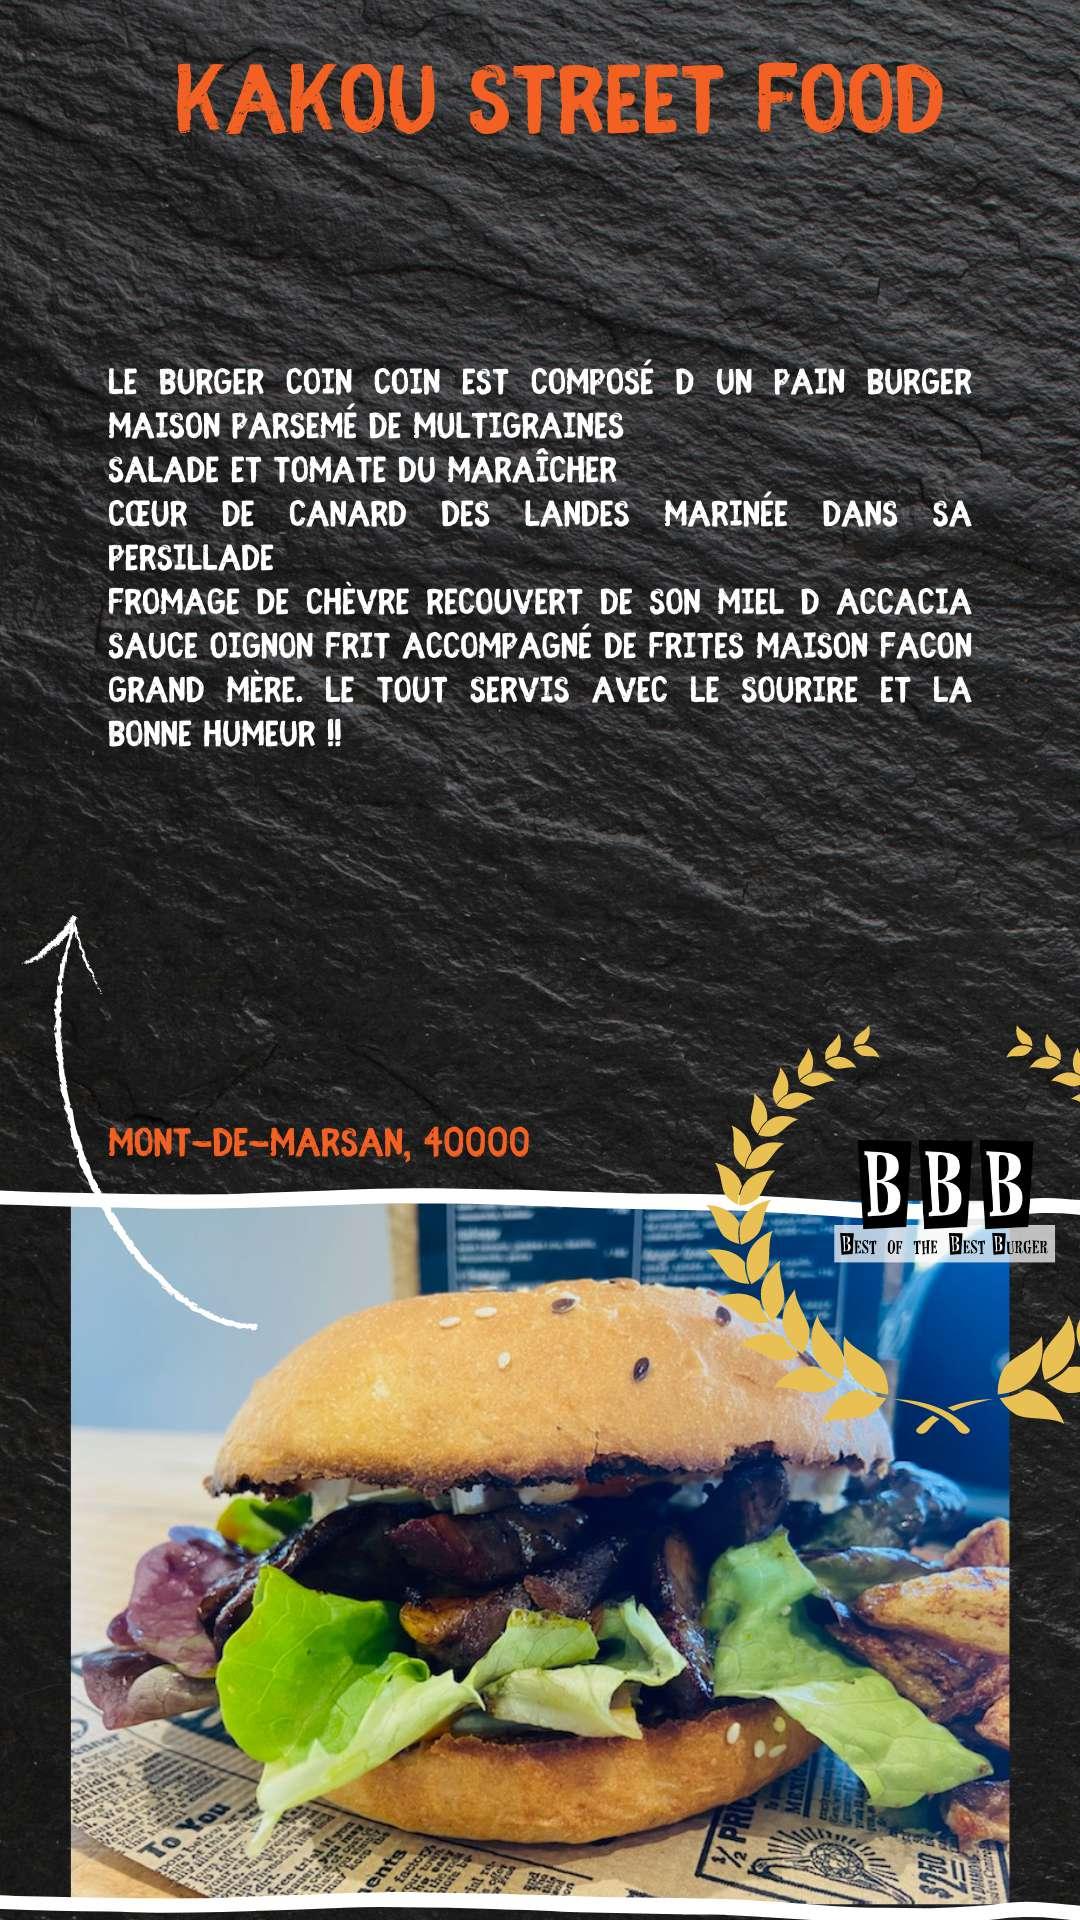 Burger du Kakou Street Food